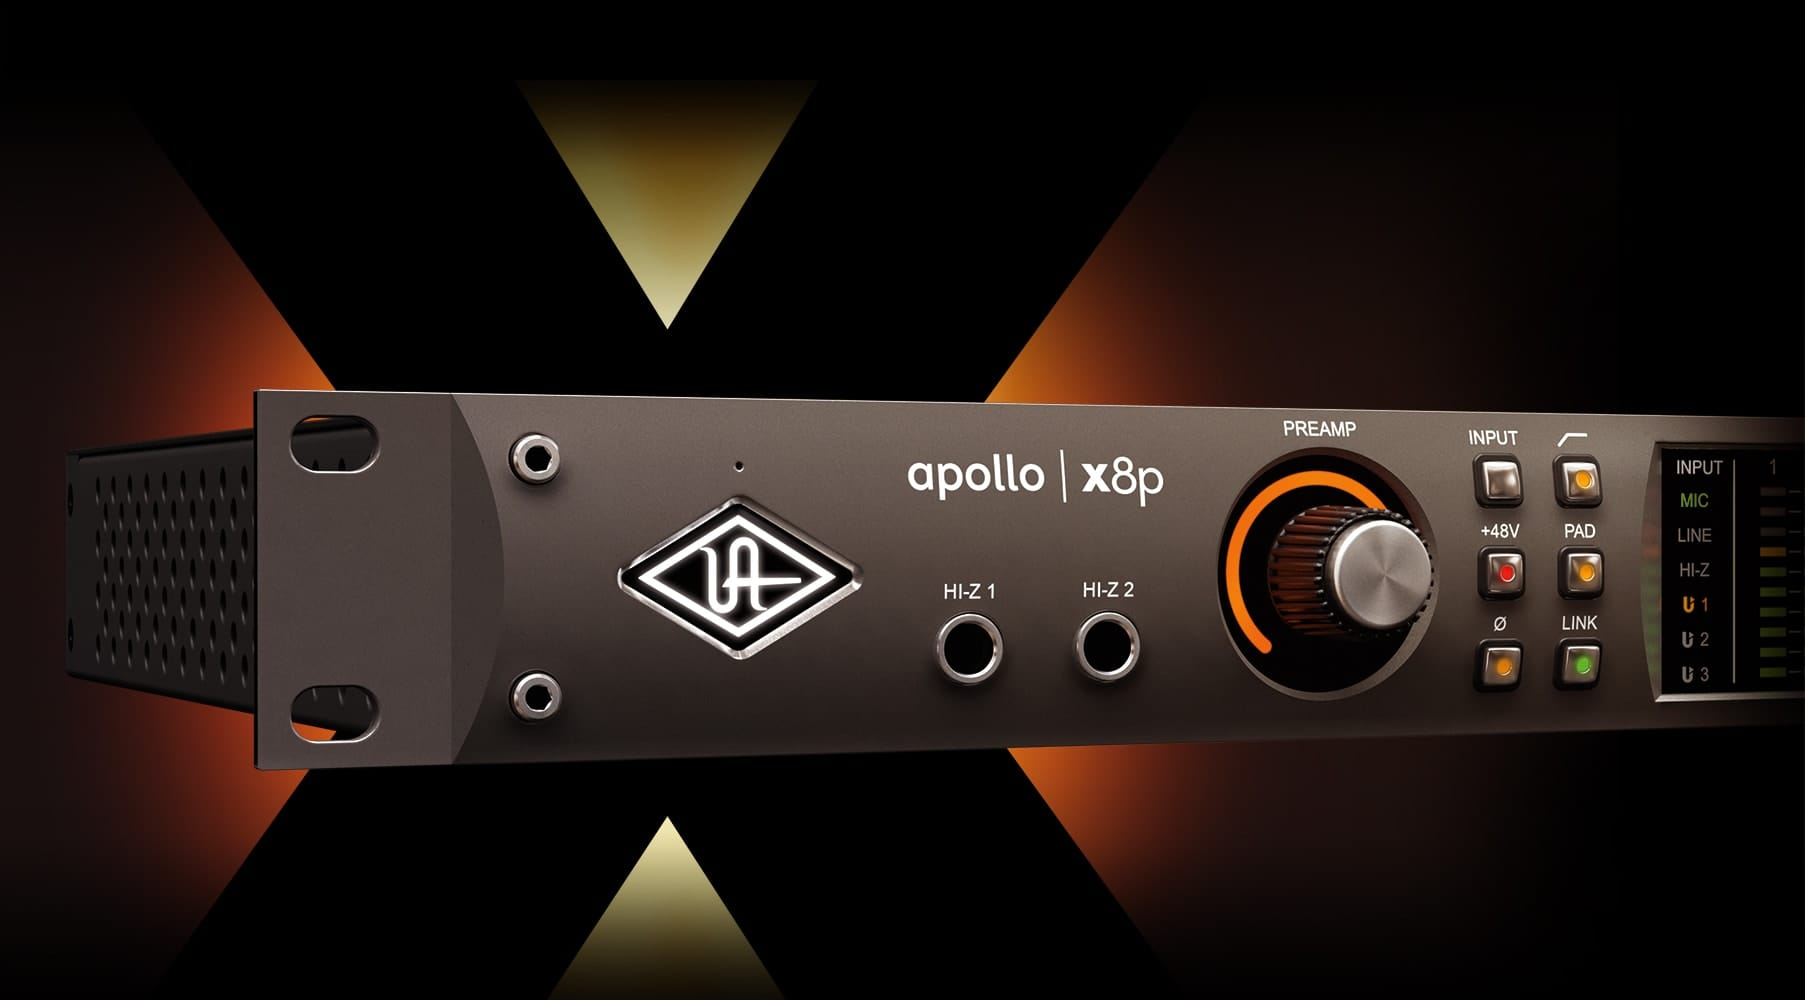 Apollo x8p | Thunderbolt Audio Interface | Universal Audio